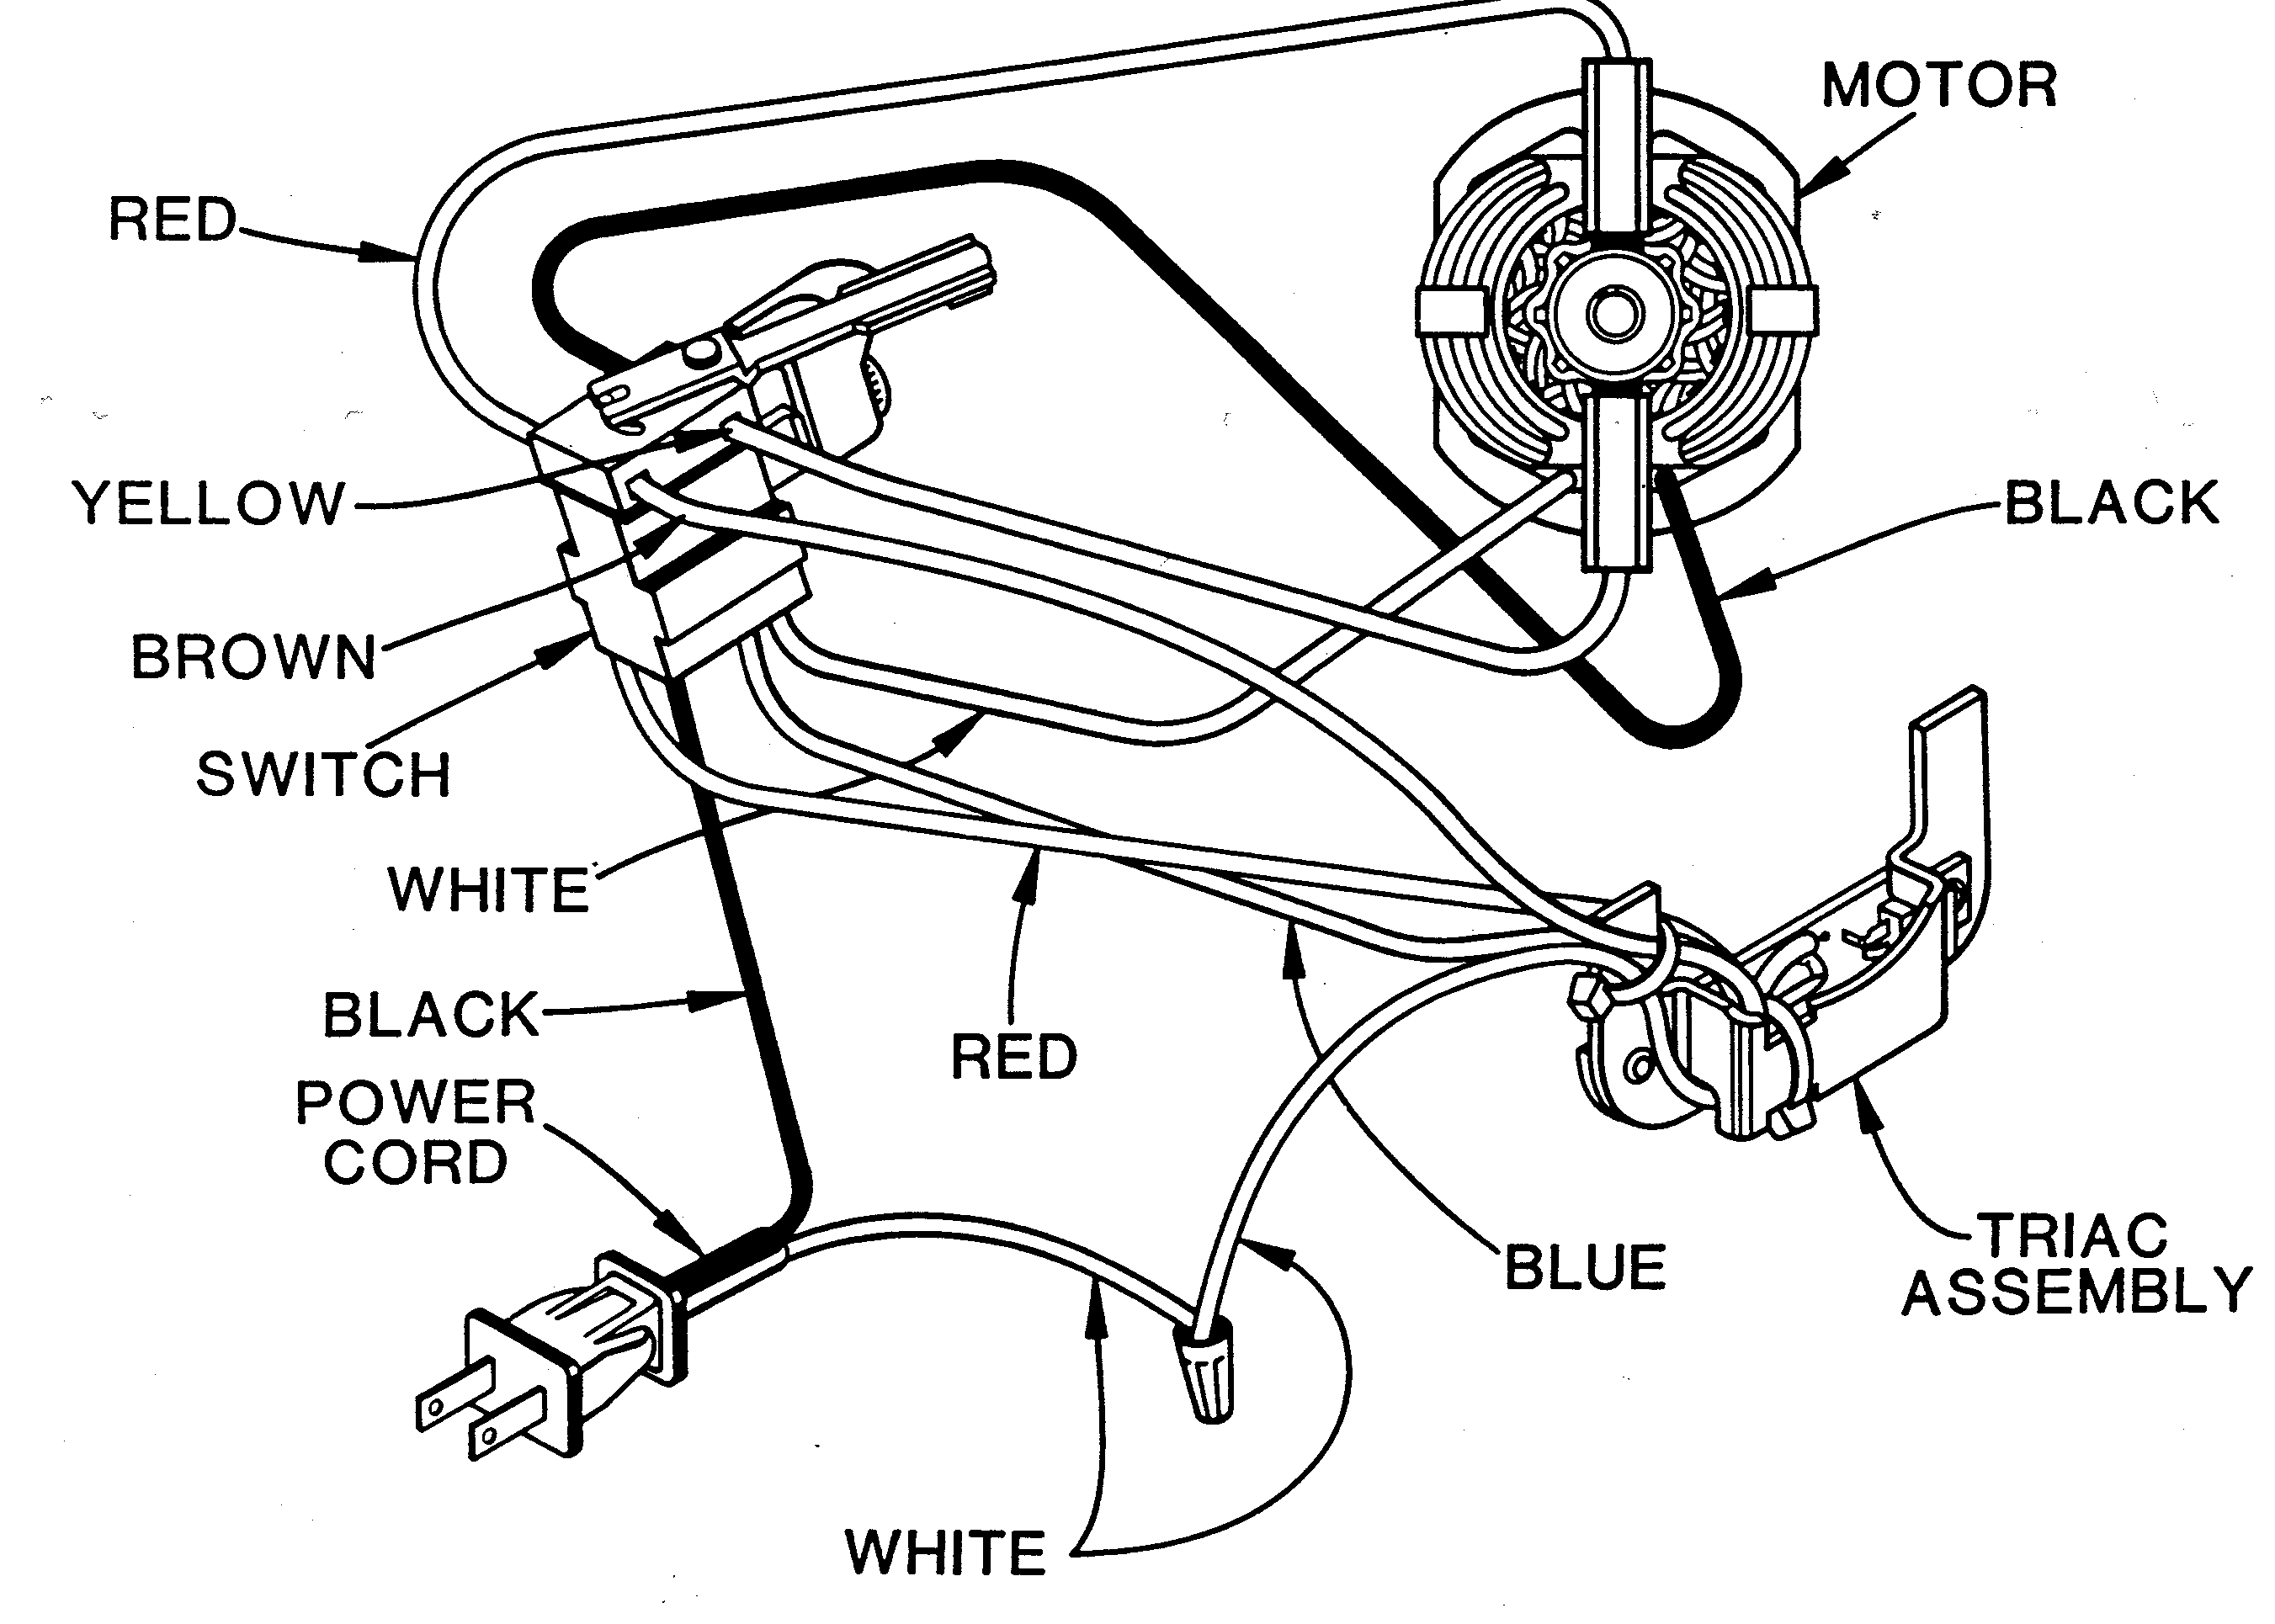 de walt motor wiring diagram tk 2969  bosch drill wiring diagram free diagram  tk 2969  bosch drill wiring diagram